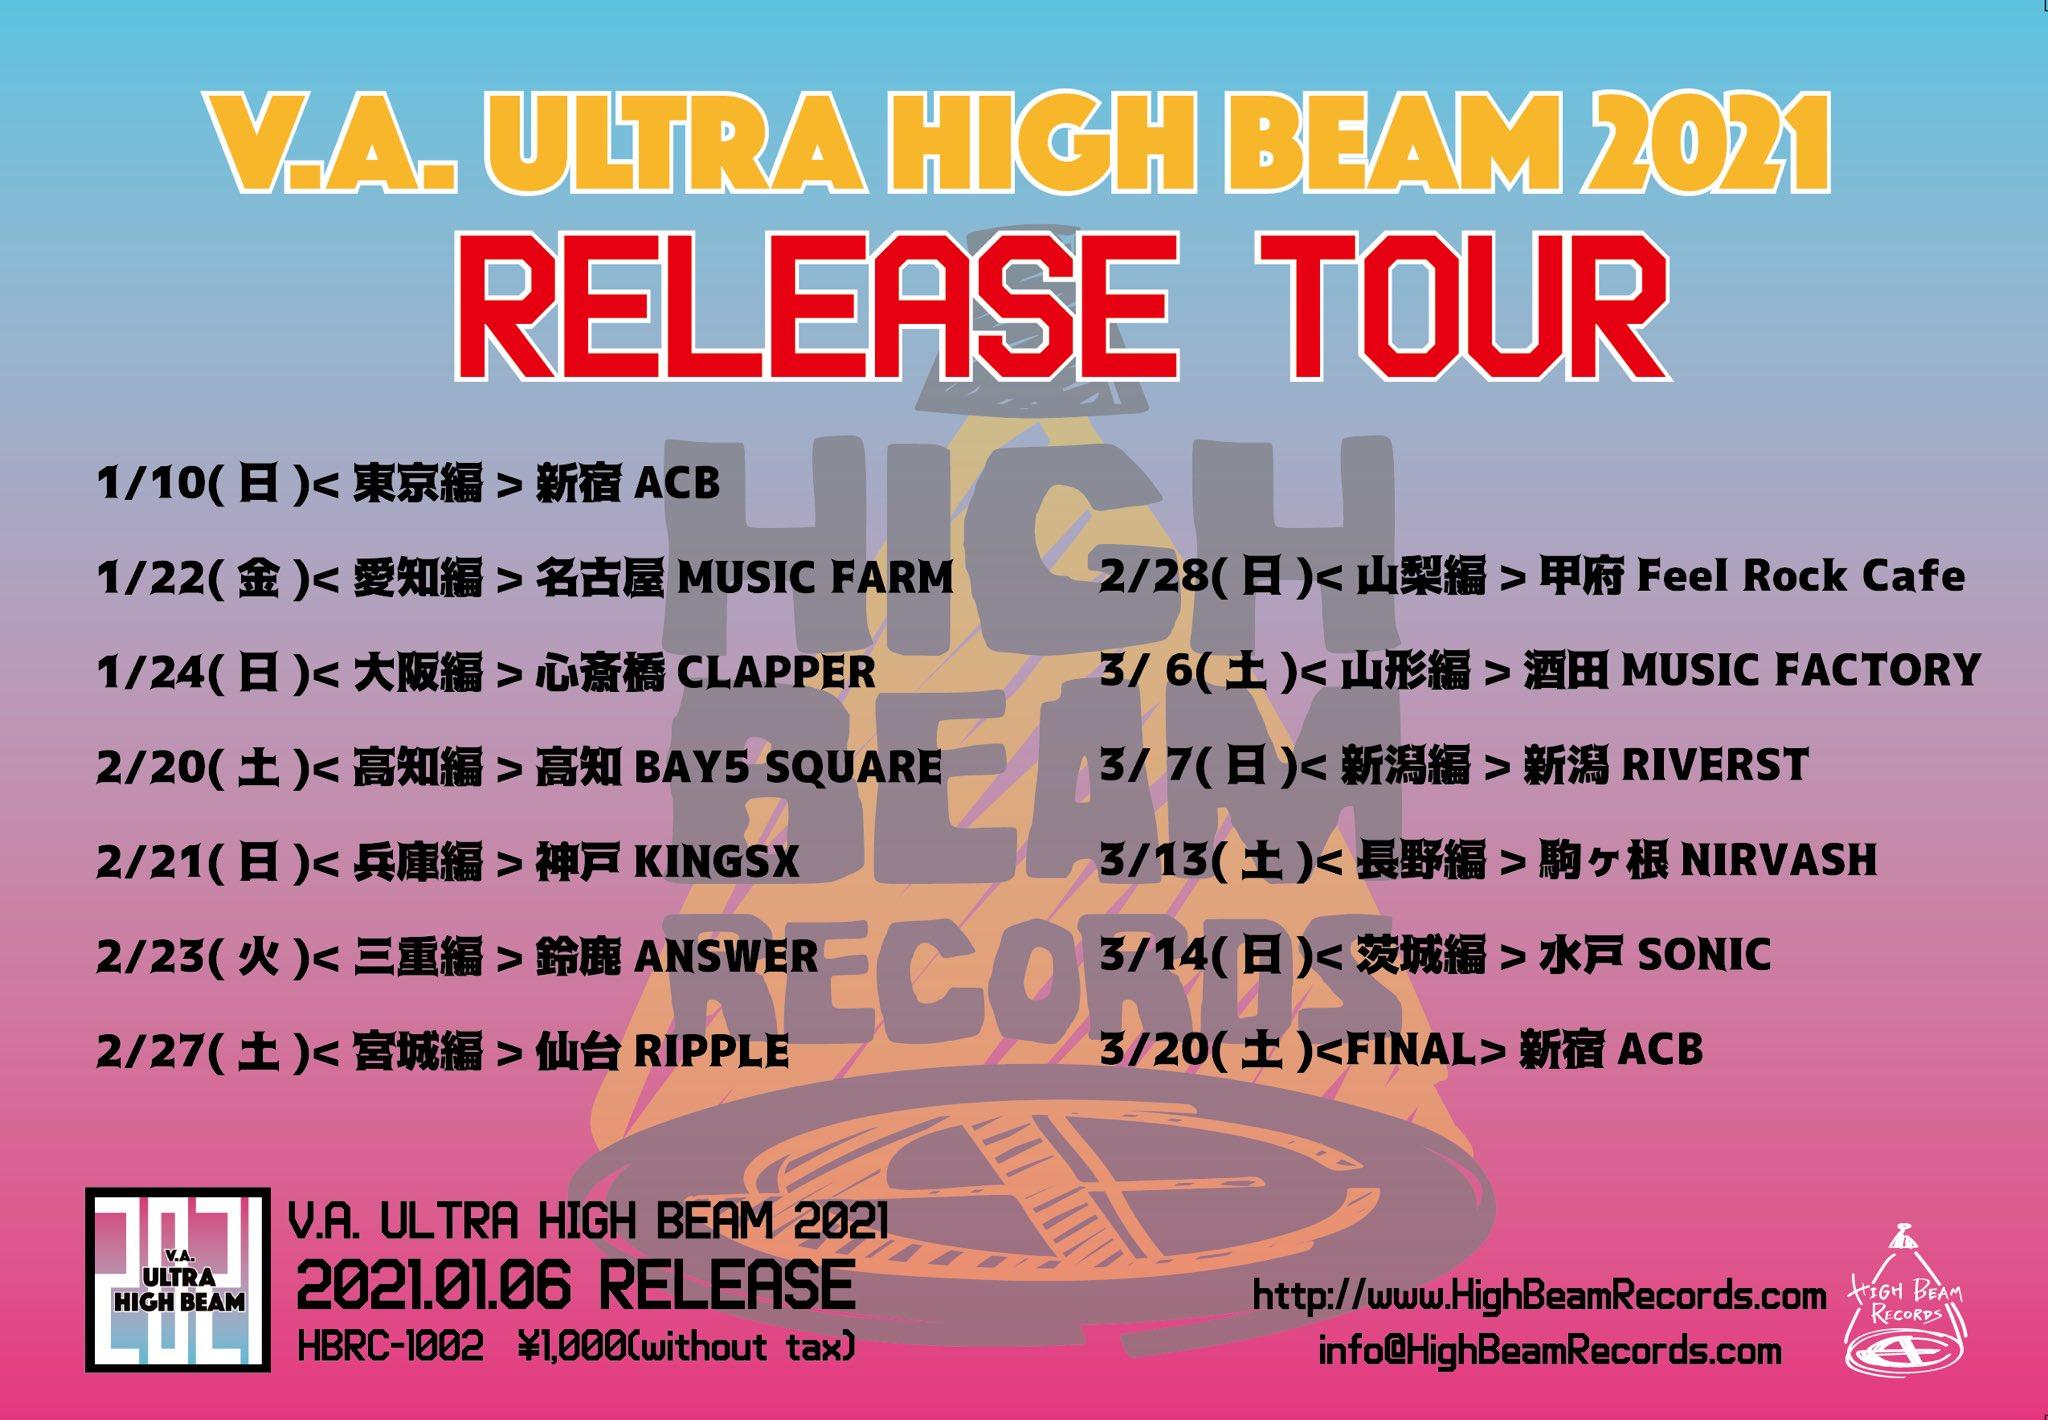 V.A.  ULTRA HIGH BEAM 2021  RELEASE TOUR ~新潟編~